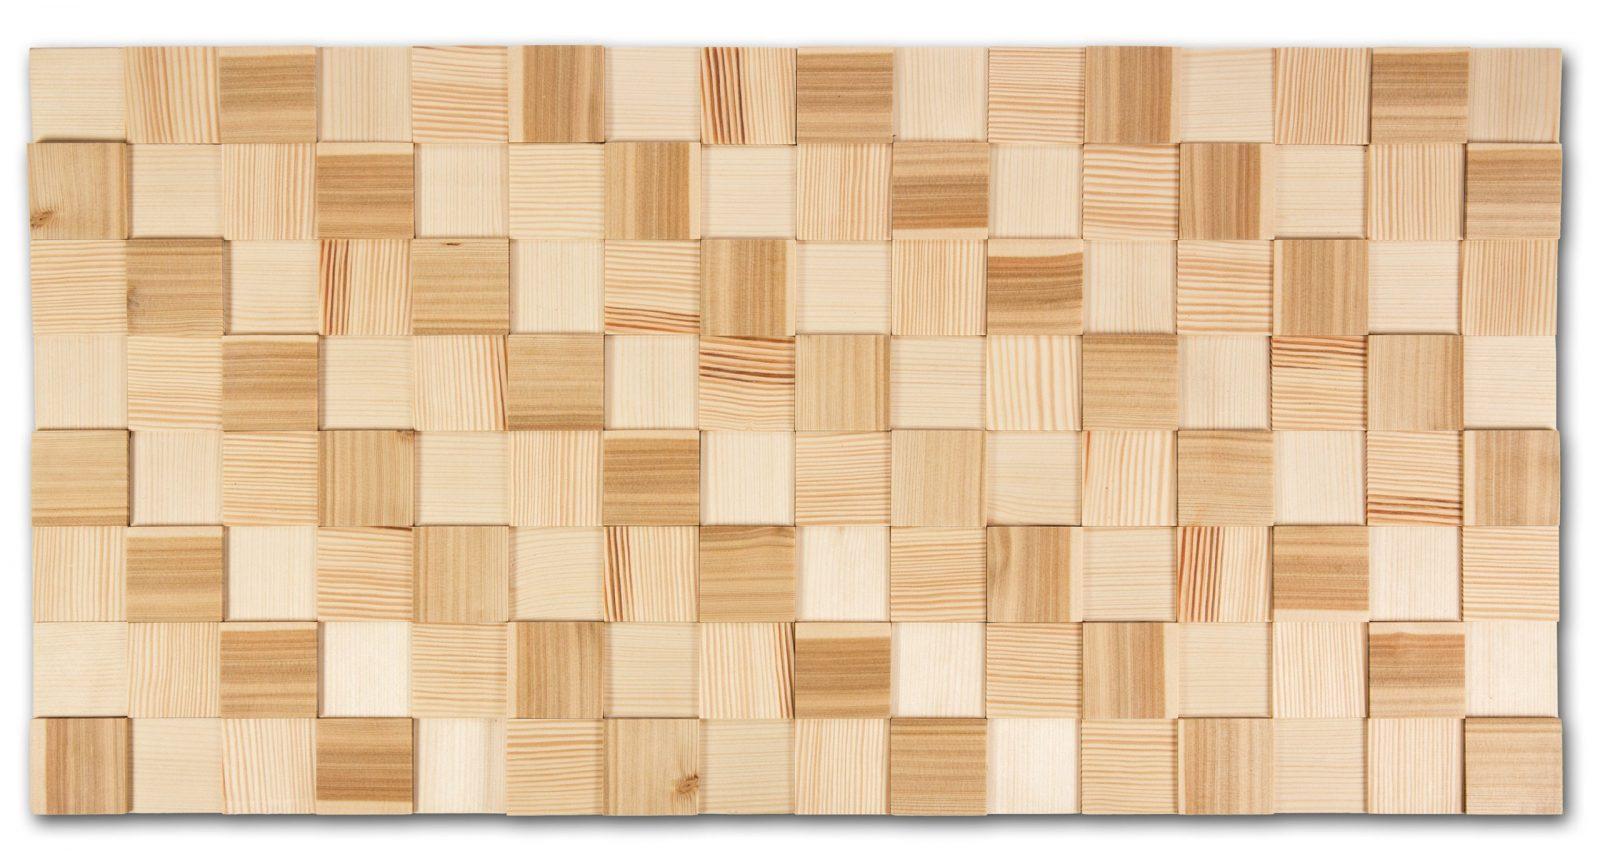 Wandverkleidung Echtholz, Deckenpaneele